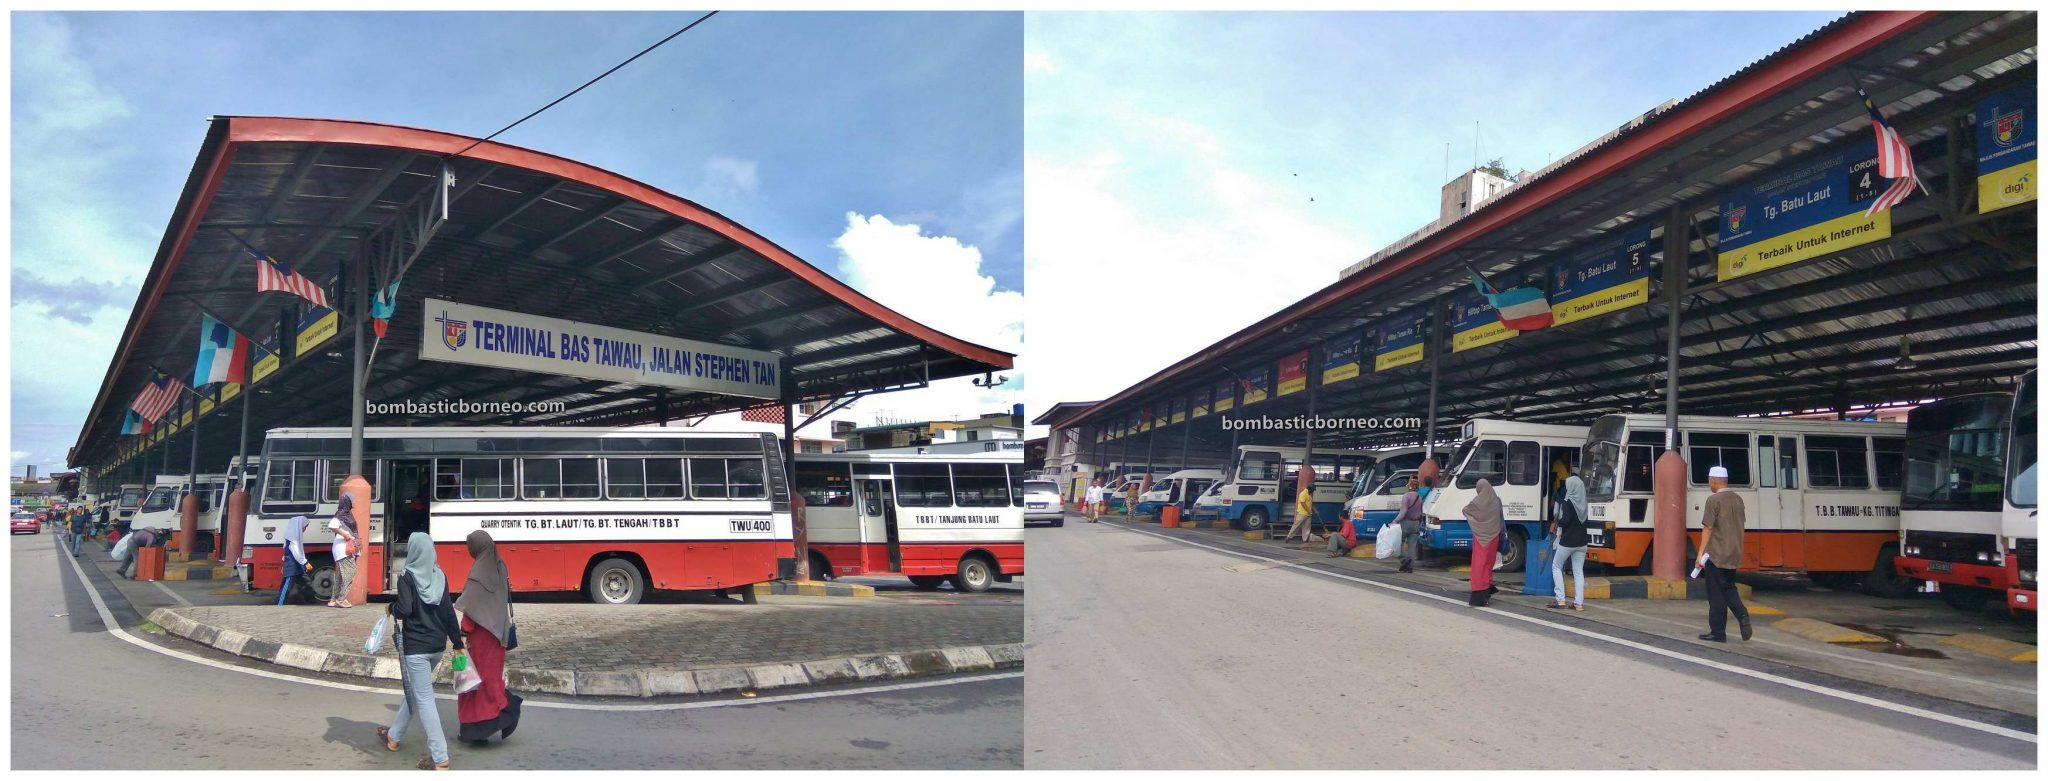 pengangkutan, bus station, backpackers, destination, exploration, Pekan, town, Tanjung Market, Waterfront, Tourism, Cross Border, Borneo, 探索婆罗洲游踪, 马来西亚沙巴斗湖